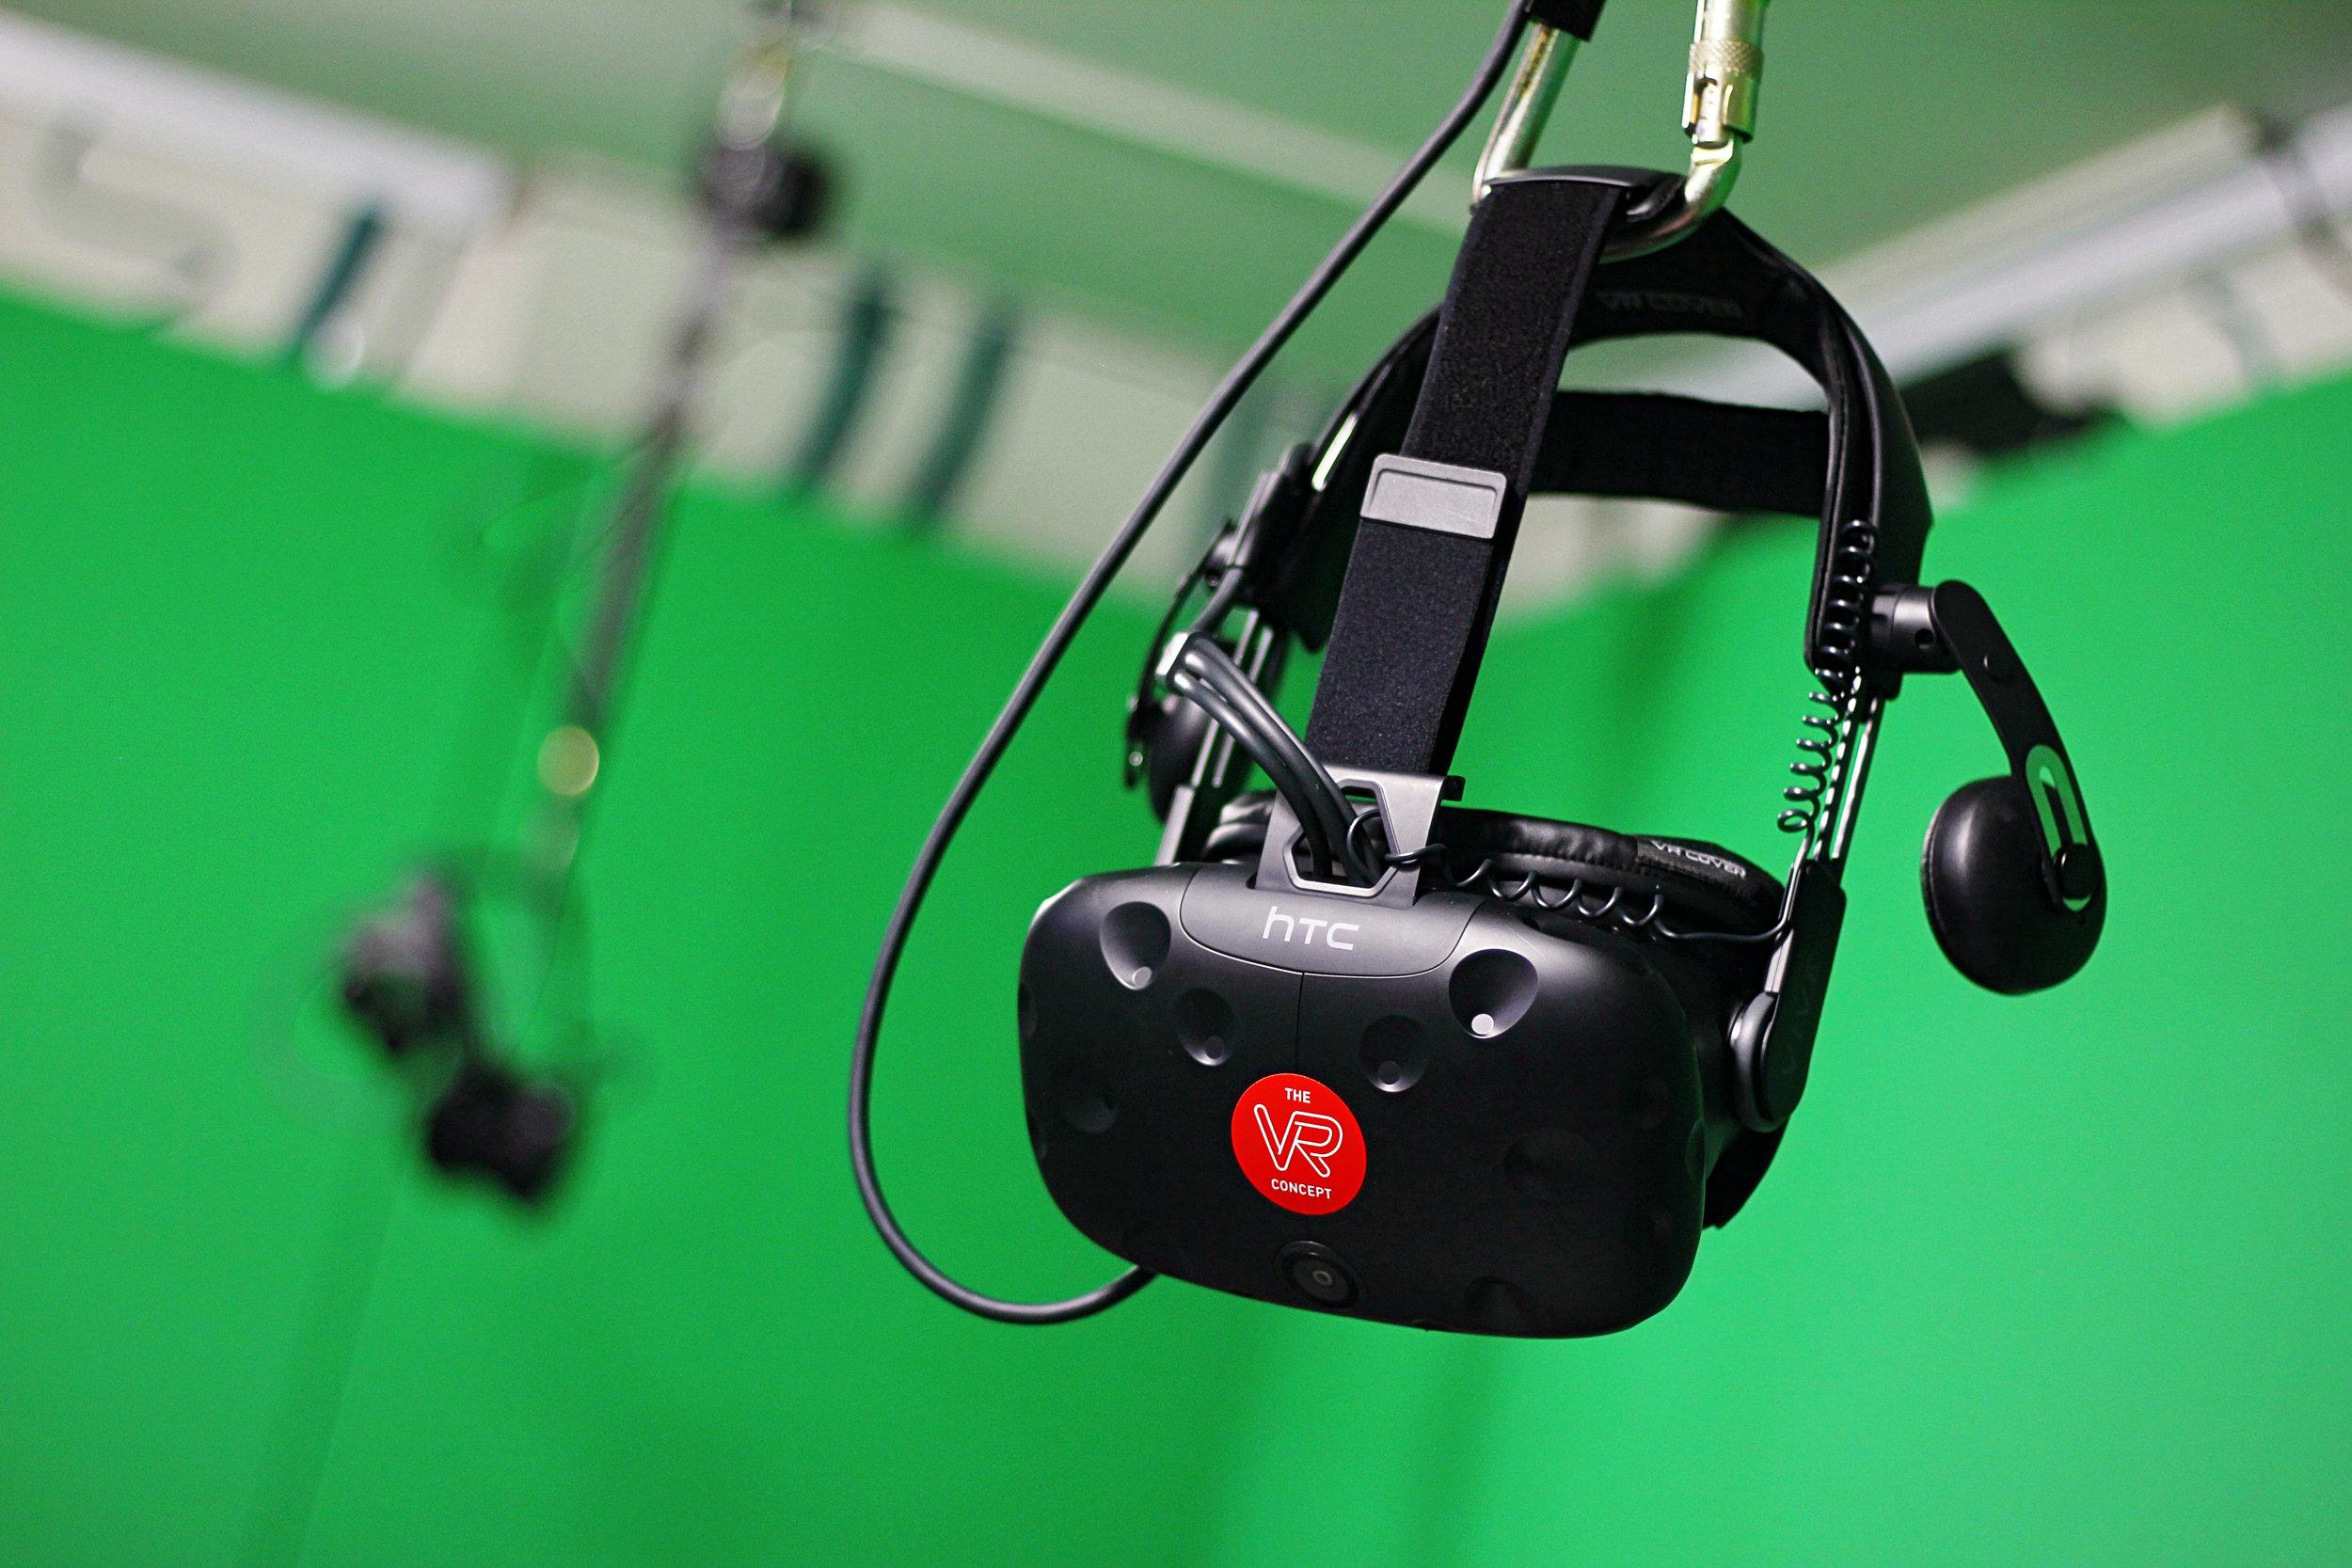 VR Concept My PhotosIMG_1637.jpg